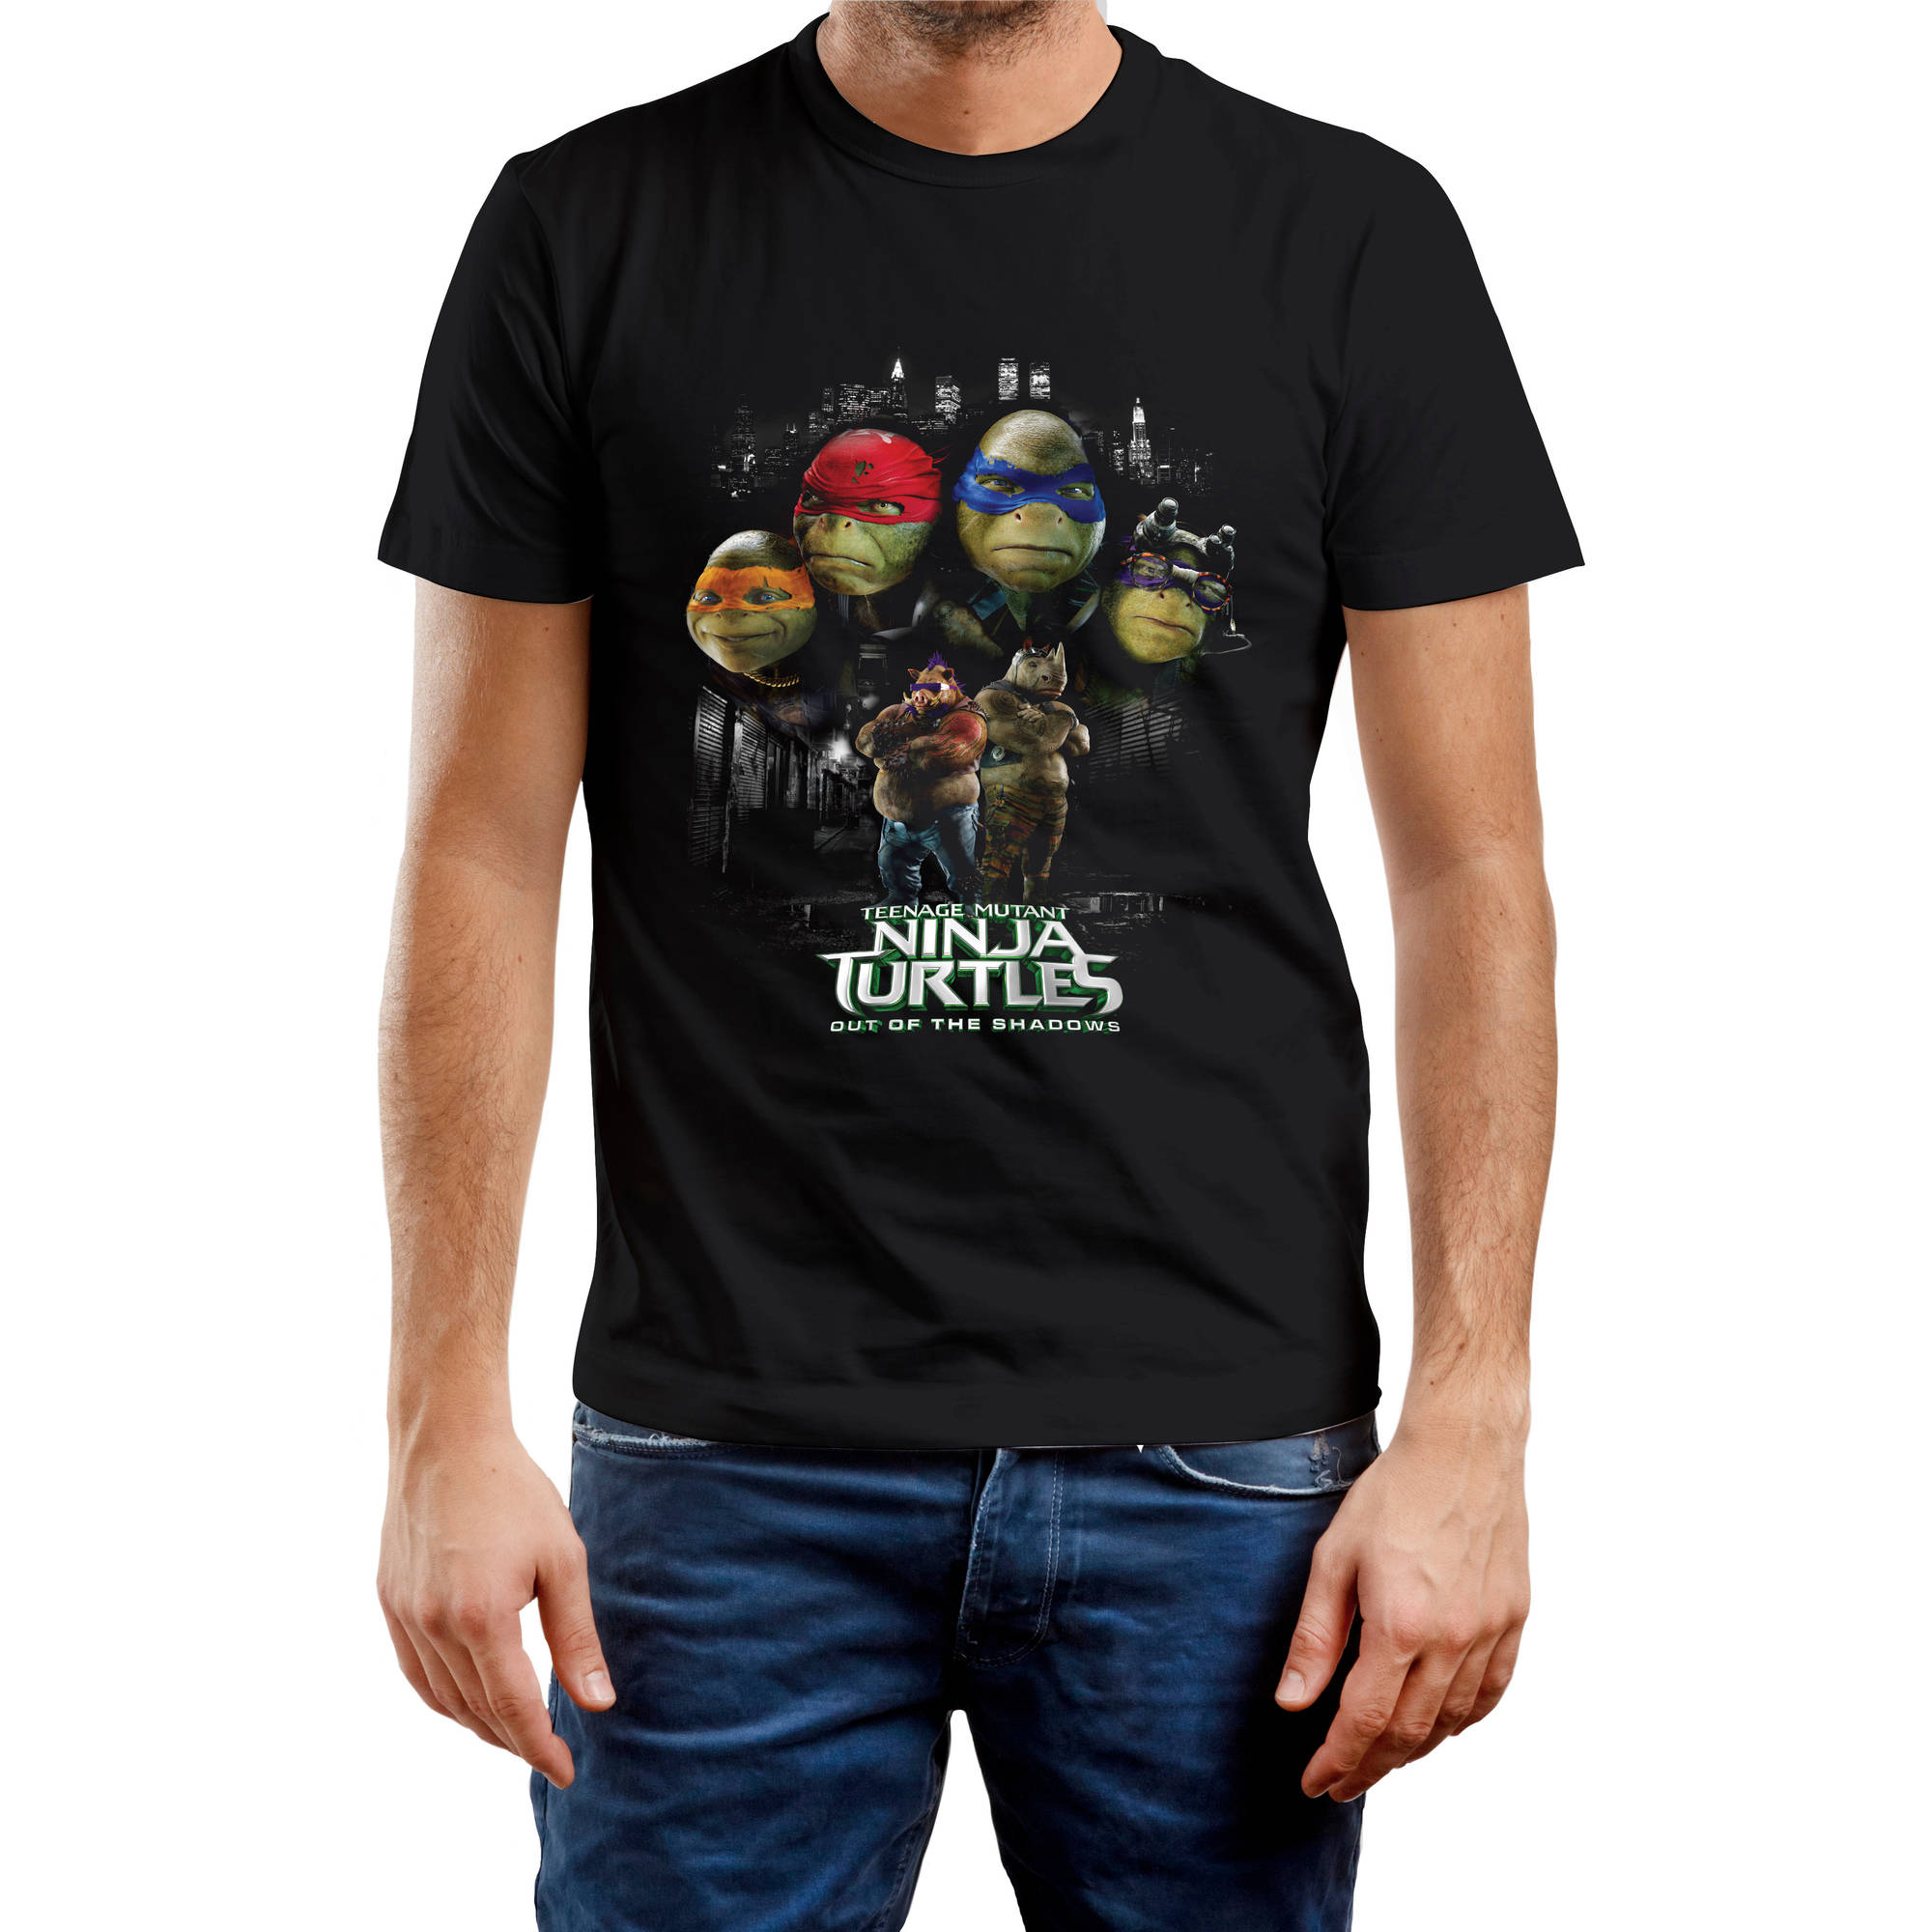 Teenage Mutant Ninja Turtles Men's Graphic Tee